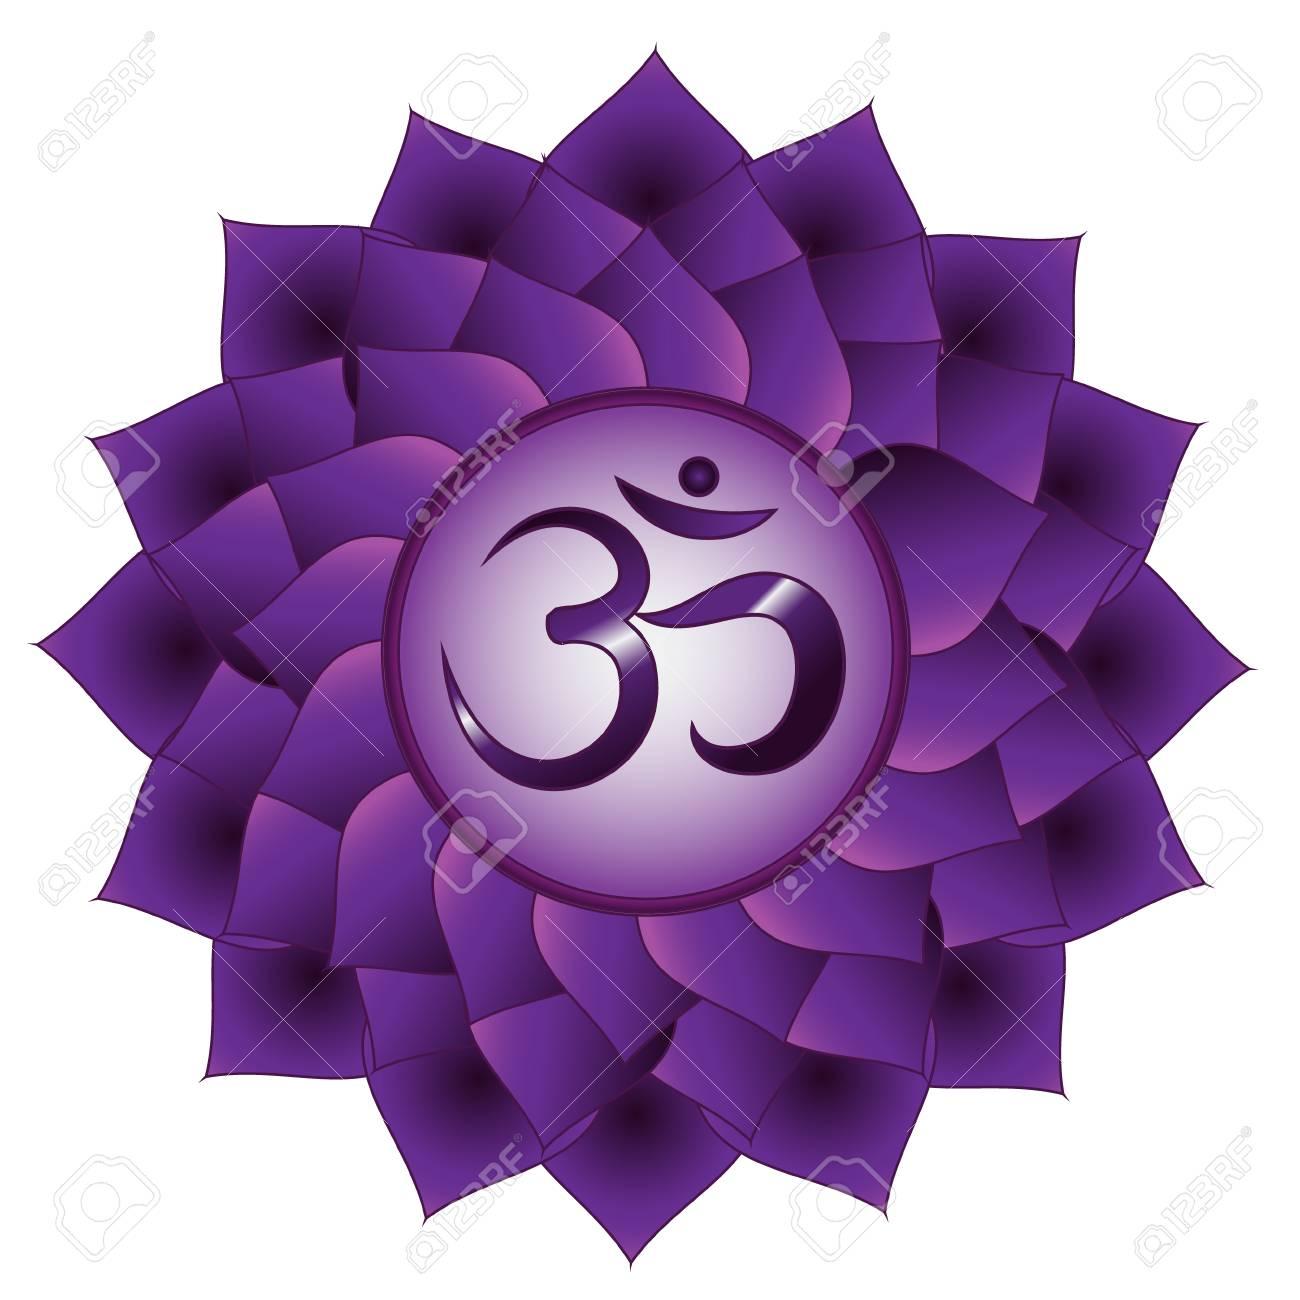 Sahasrara Chakra Seventh Crown Chakra Symbol Isolated Vector